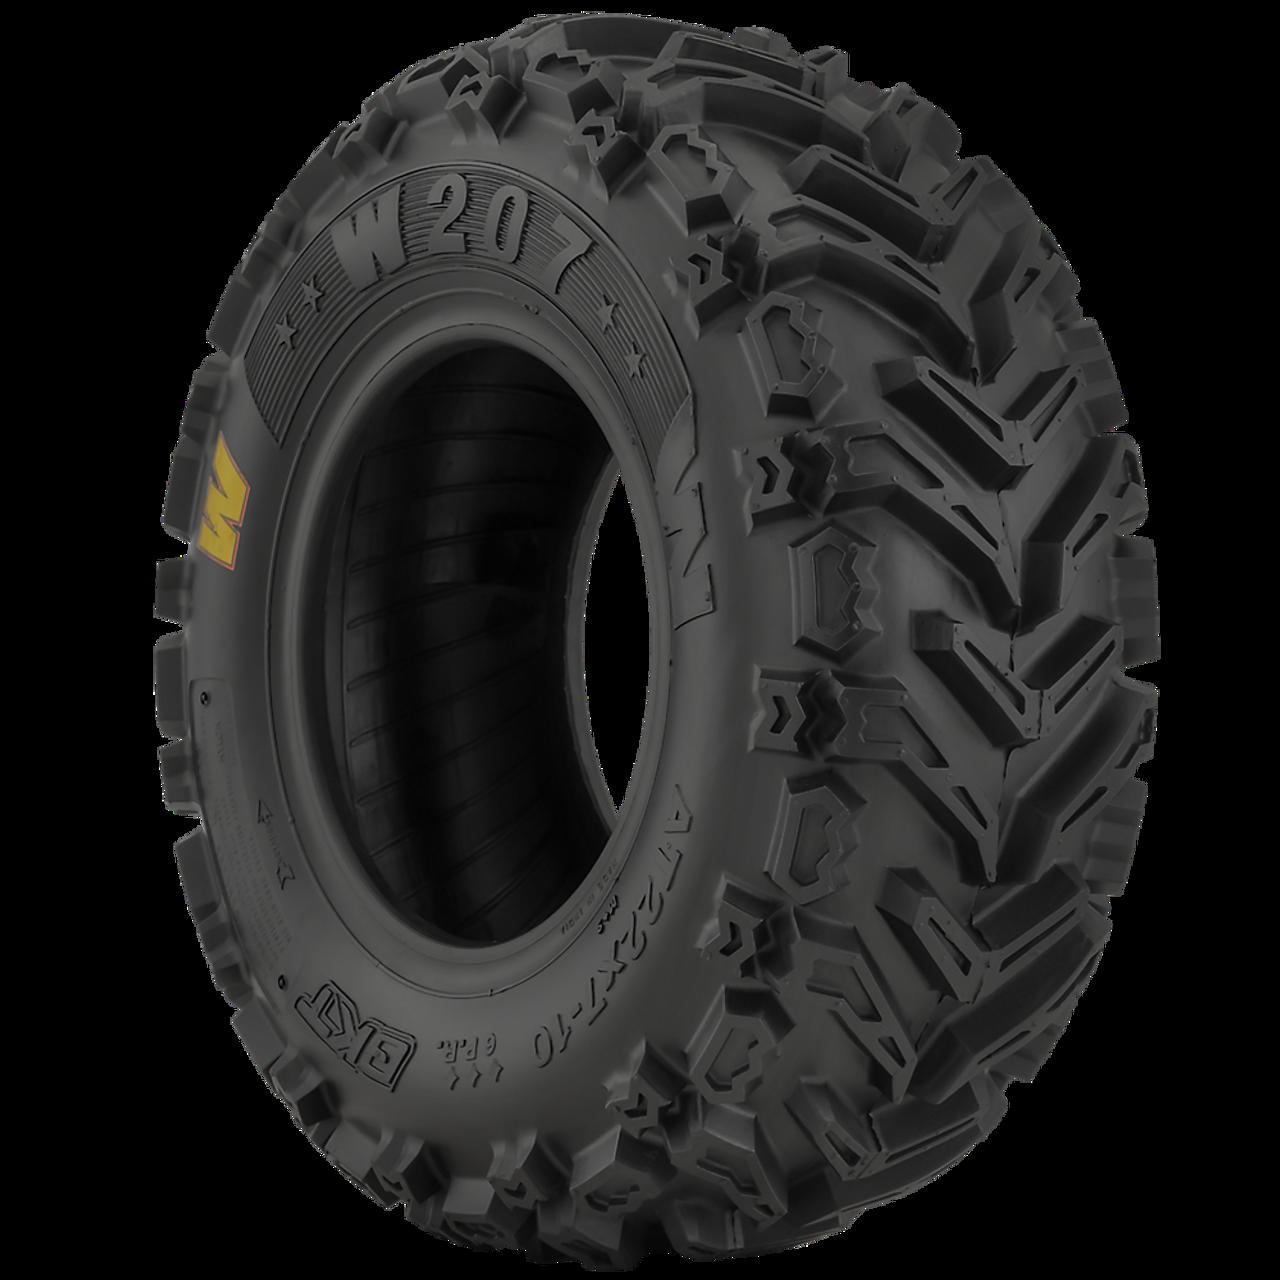 New Tire 22 11.00 10 BKT W207 6 ply ATV 22x11.00-10 22x11-10